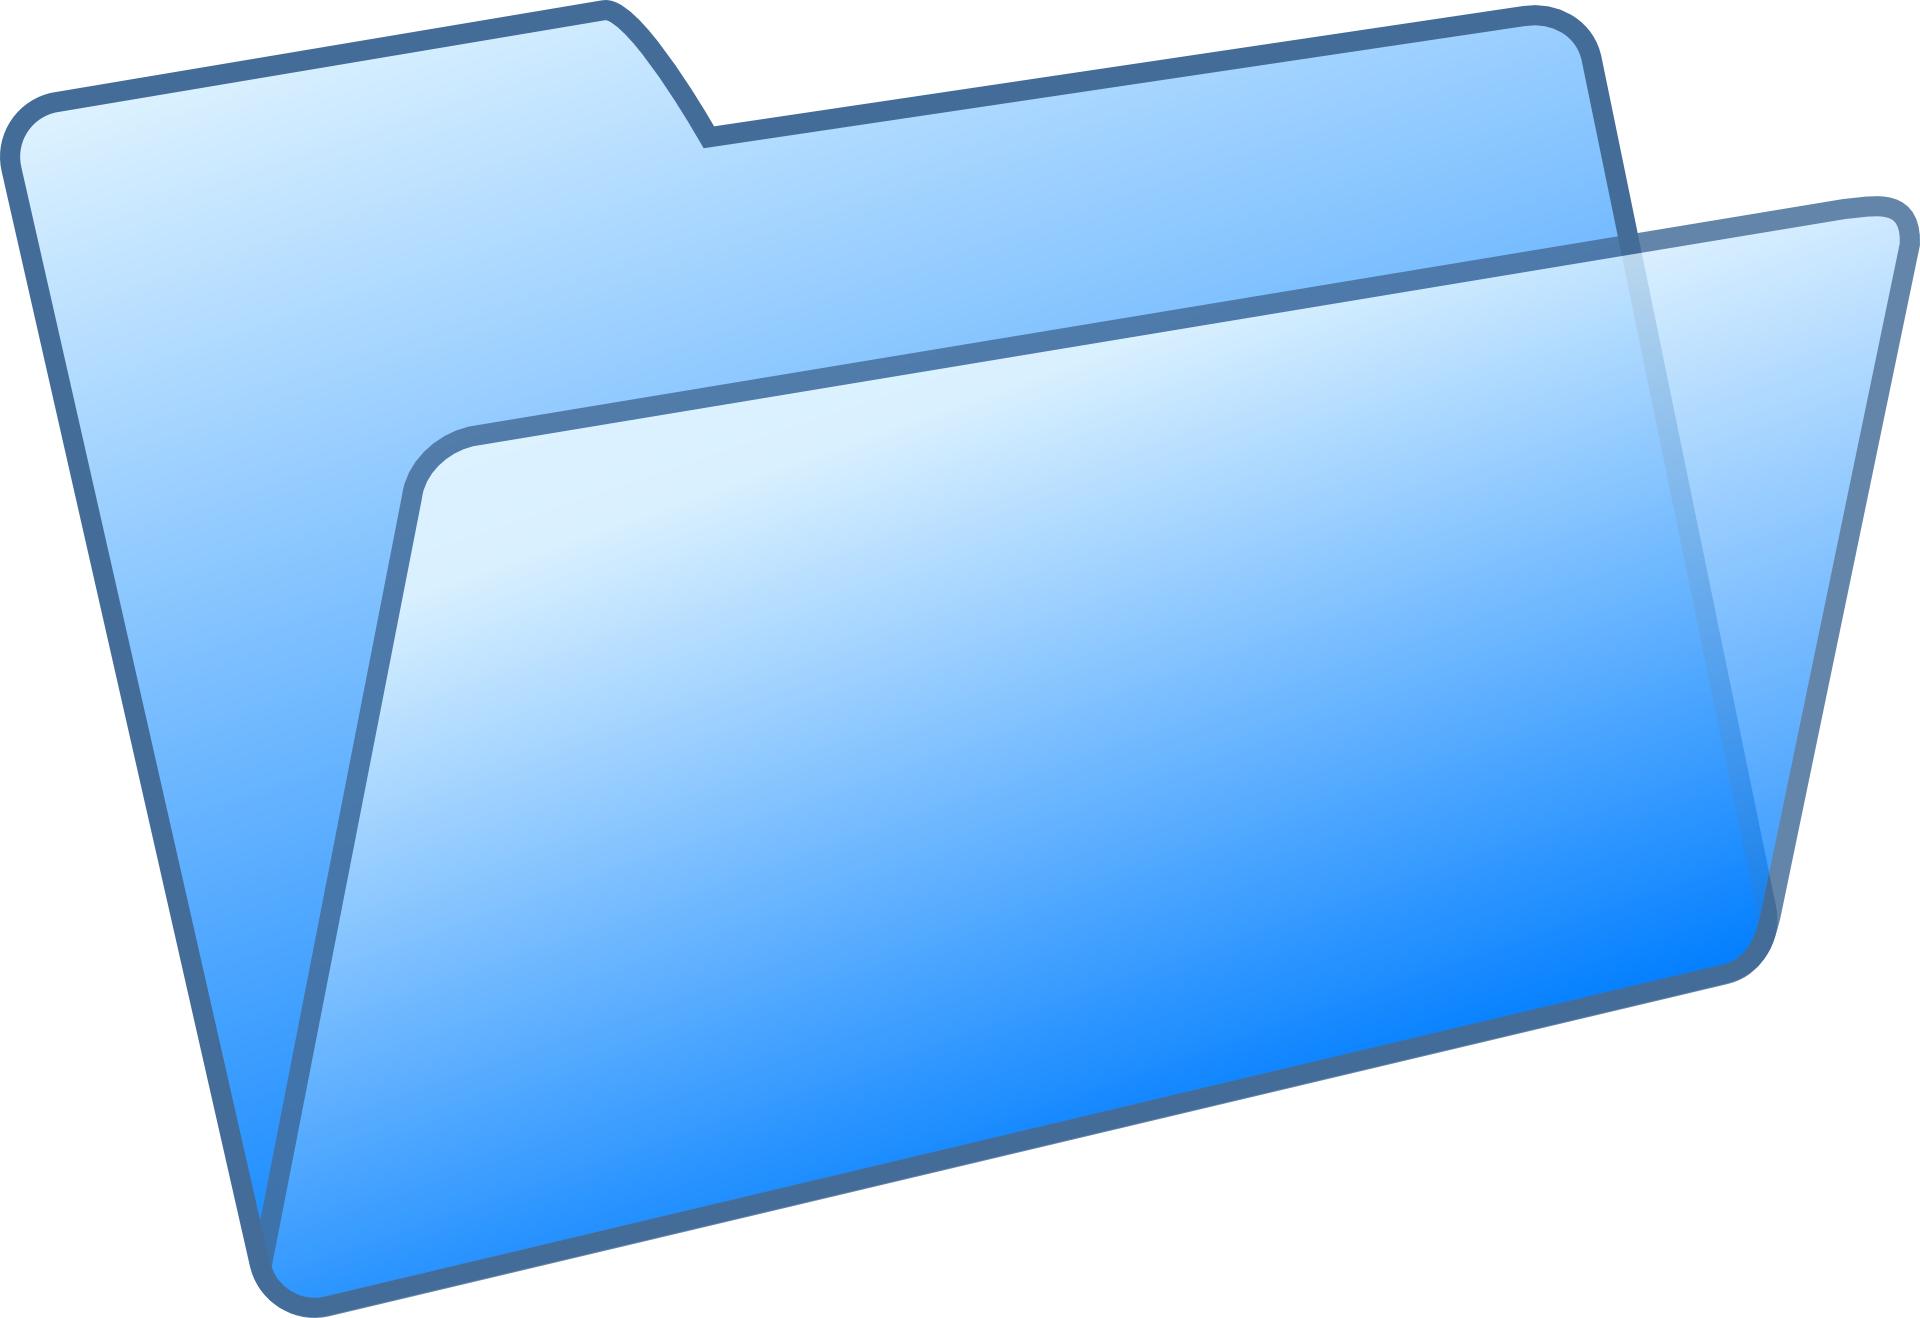 1920x1318 Blue File Folder Vector Free Psd,vector,icons